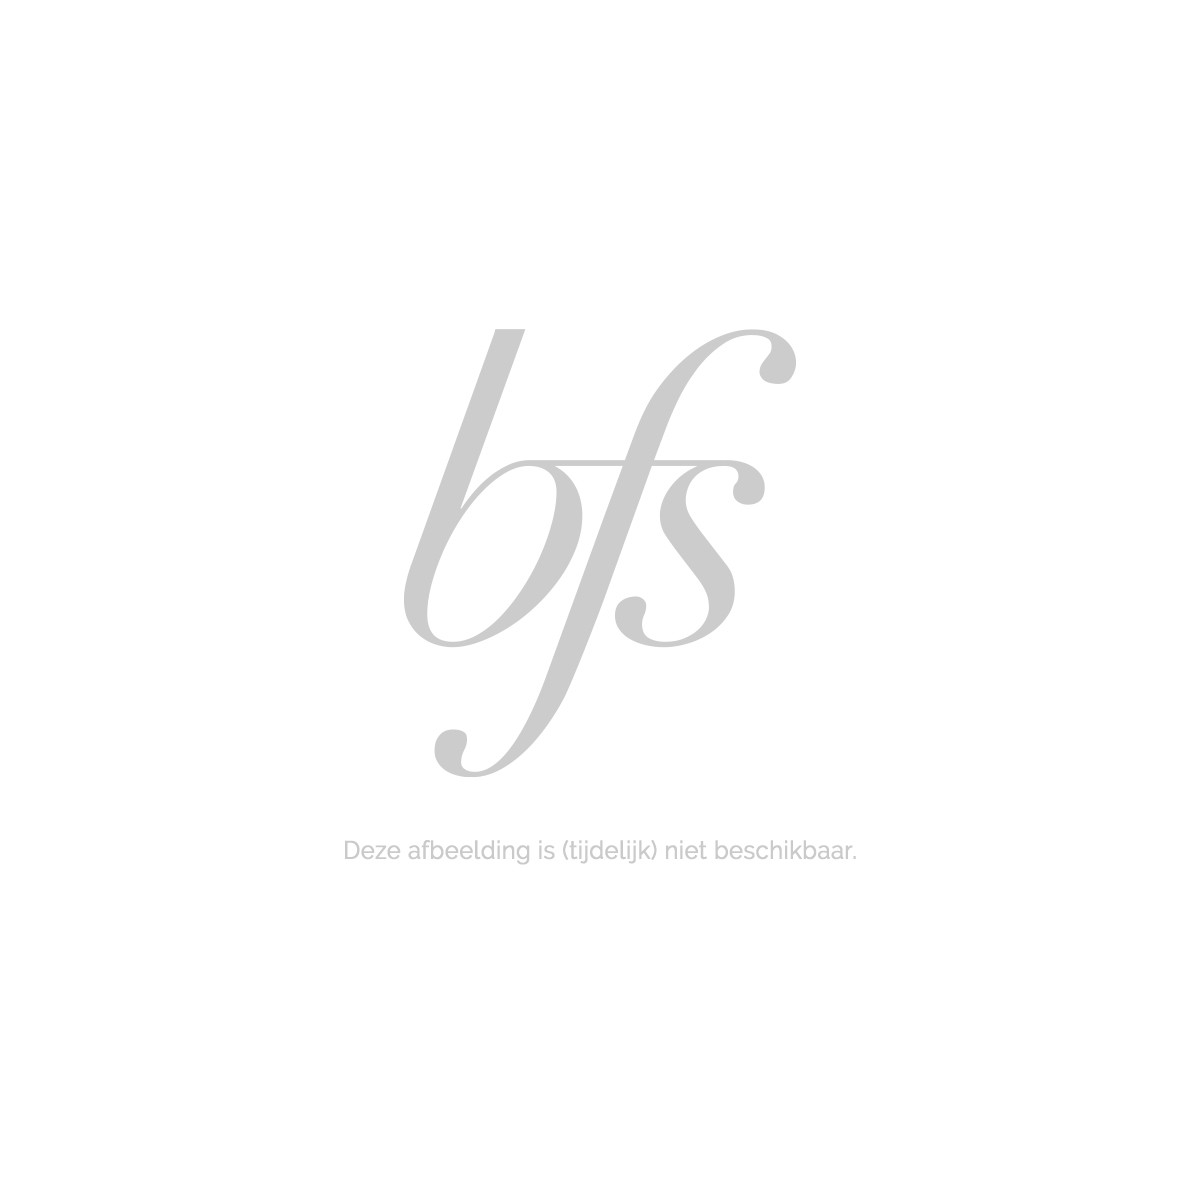 Murad Balancing Moisturizer Broad Spectrum Spf15/Pa++